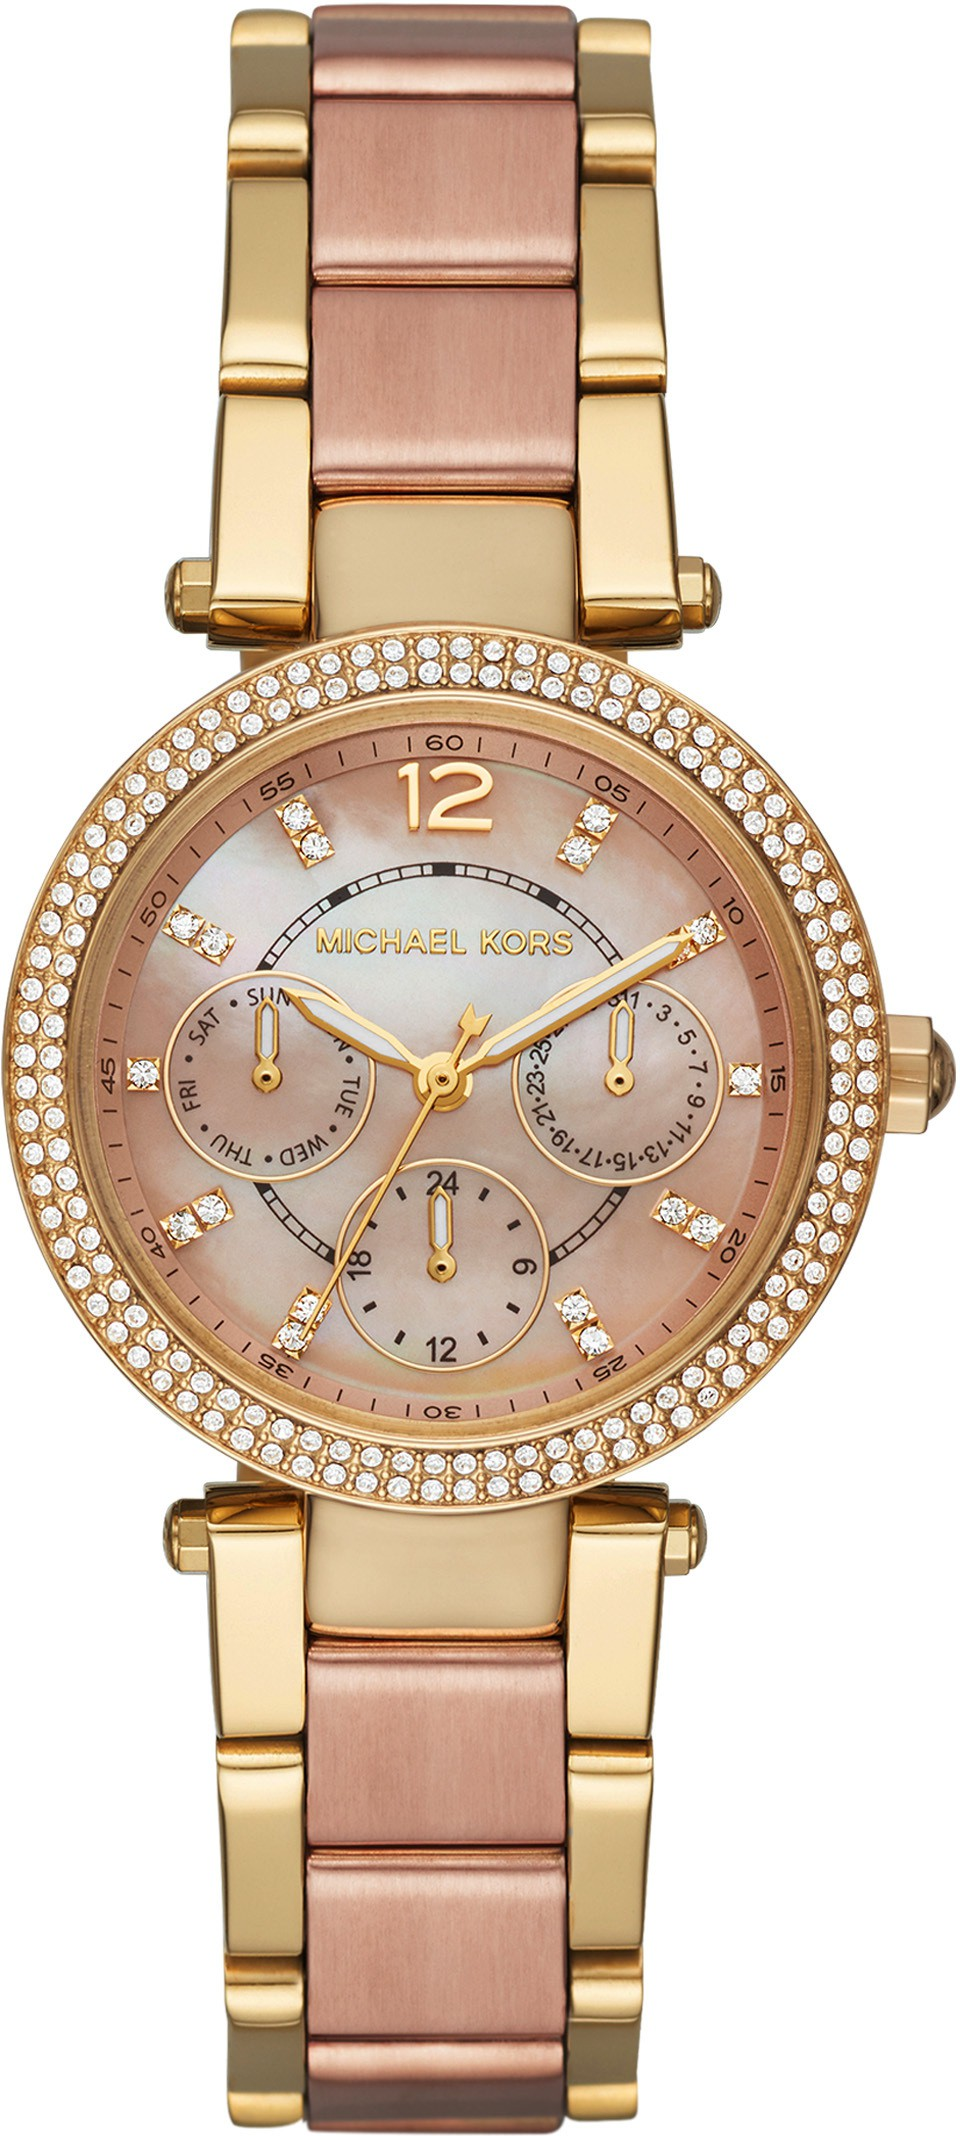 же michael kors watch price in india купленный флакон